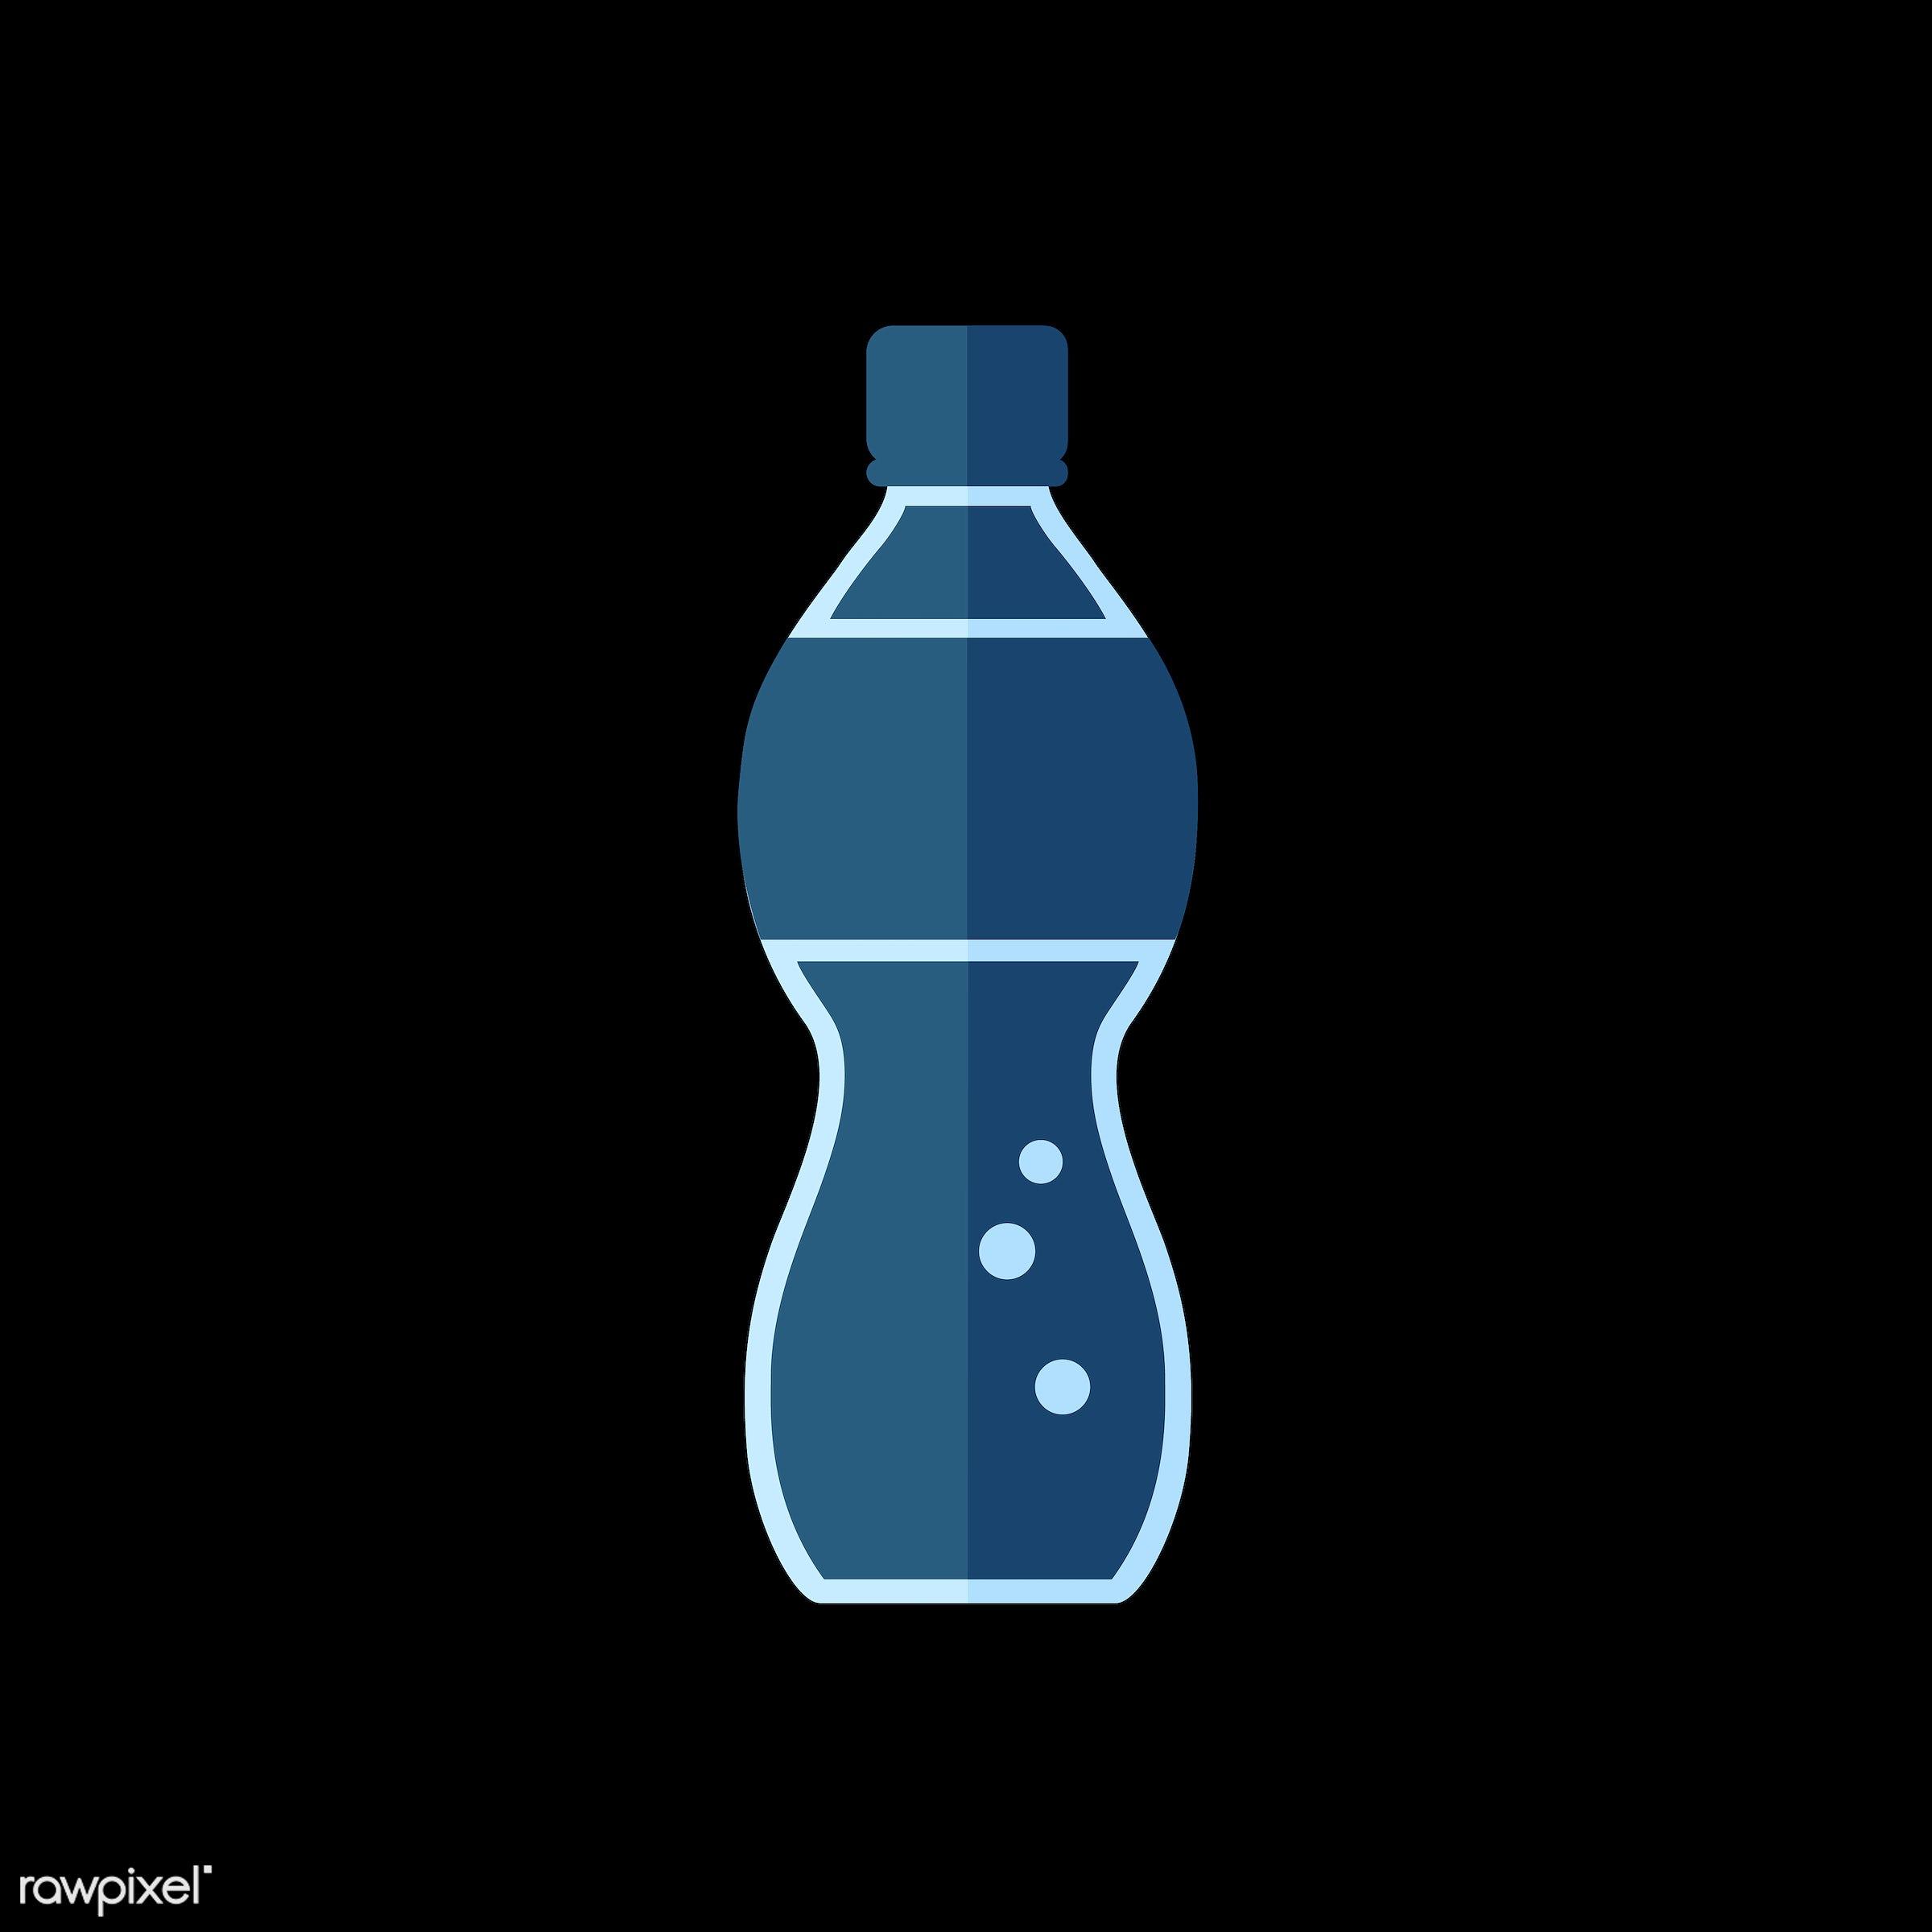 Soda bottle vector - vector, graphic, illustration, icon, symbol, colorful, cute, drink, beverage, water, soda, soda bottle...